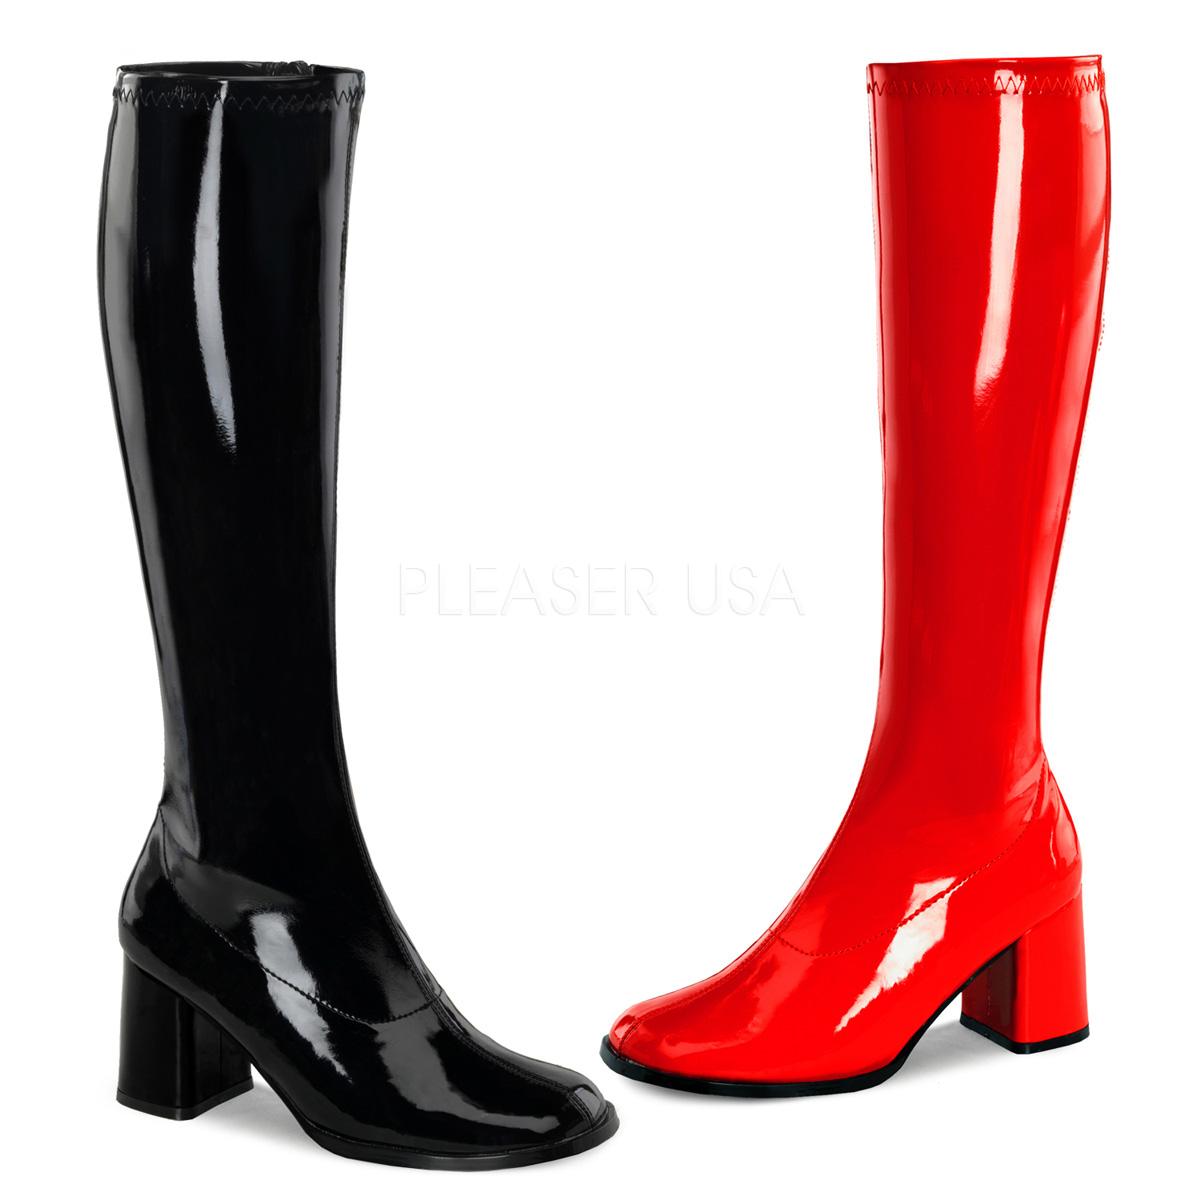 FUNTASMA(Pleaser) GOGO-300HQ ハーフカラーニーハイブーツ 黒赤片足ずつ アシンメトリー コスプレ 衣装 ◆取り寄せ